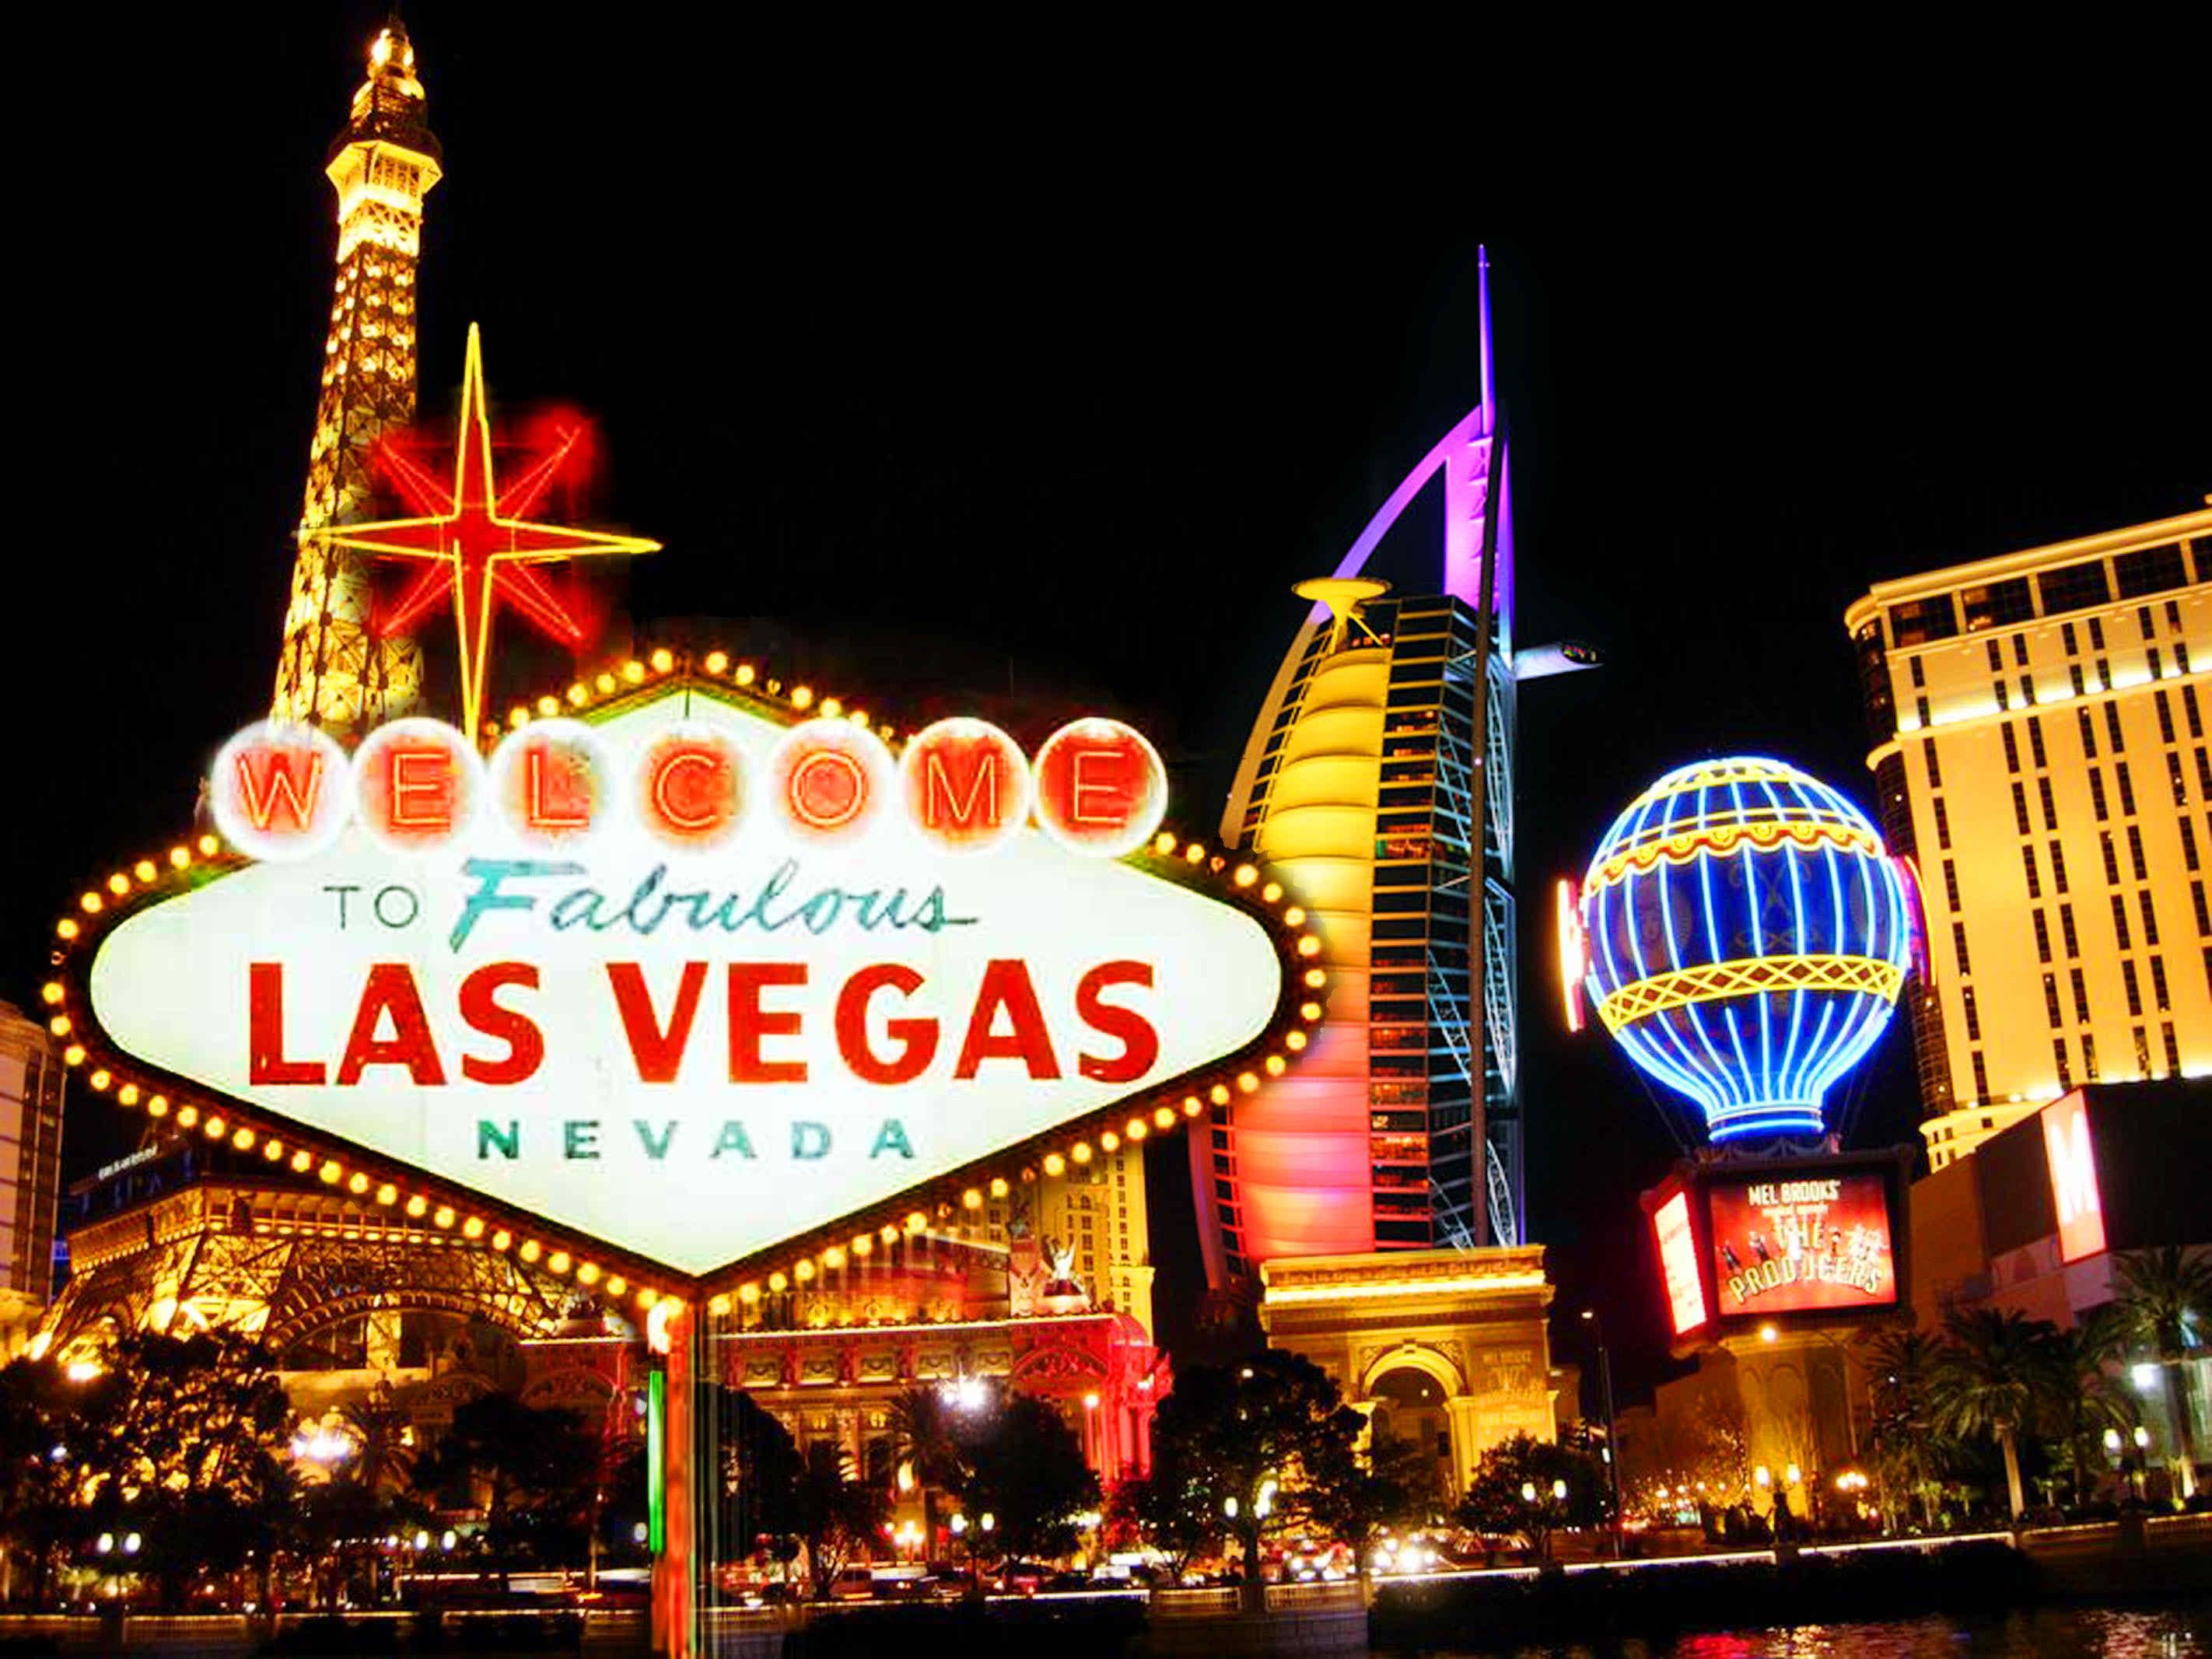 Hd Las Vegas Image